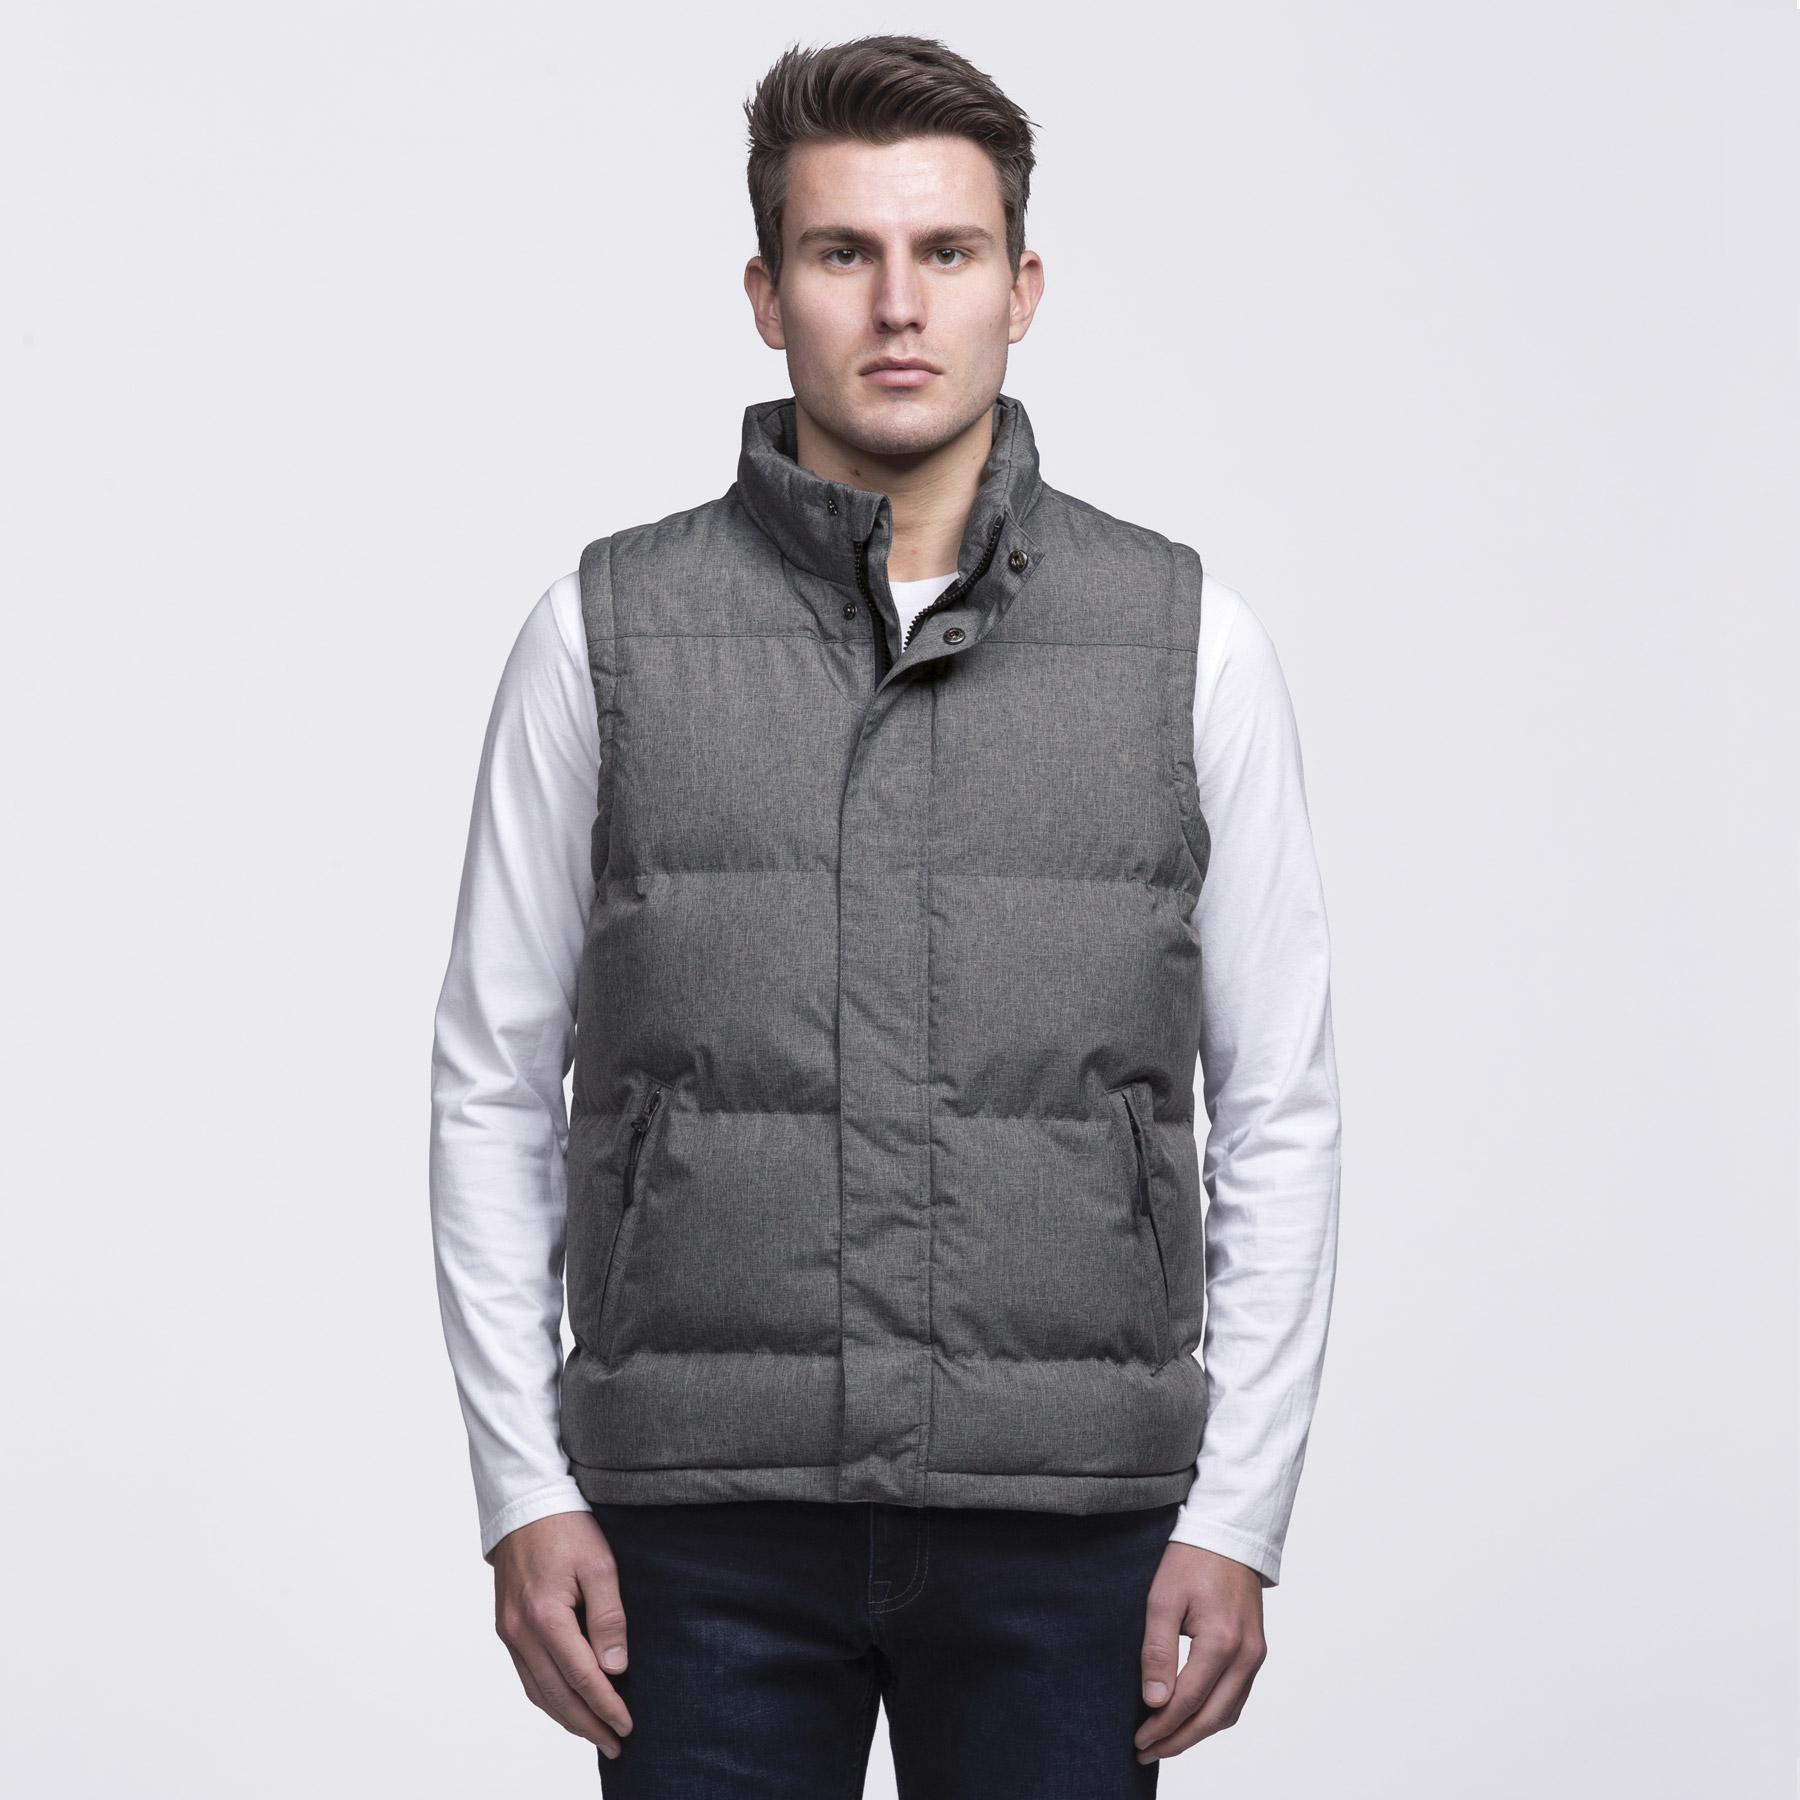 T shirt design queenstown - Smpli Mens Grey Melange Basin Puffa Jacket Front